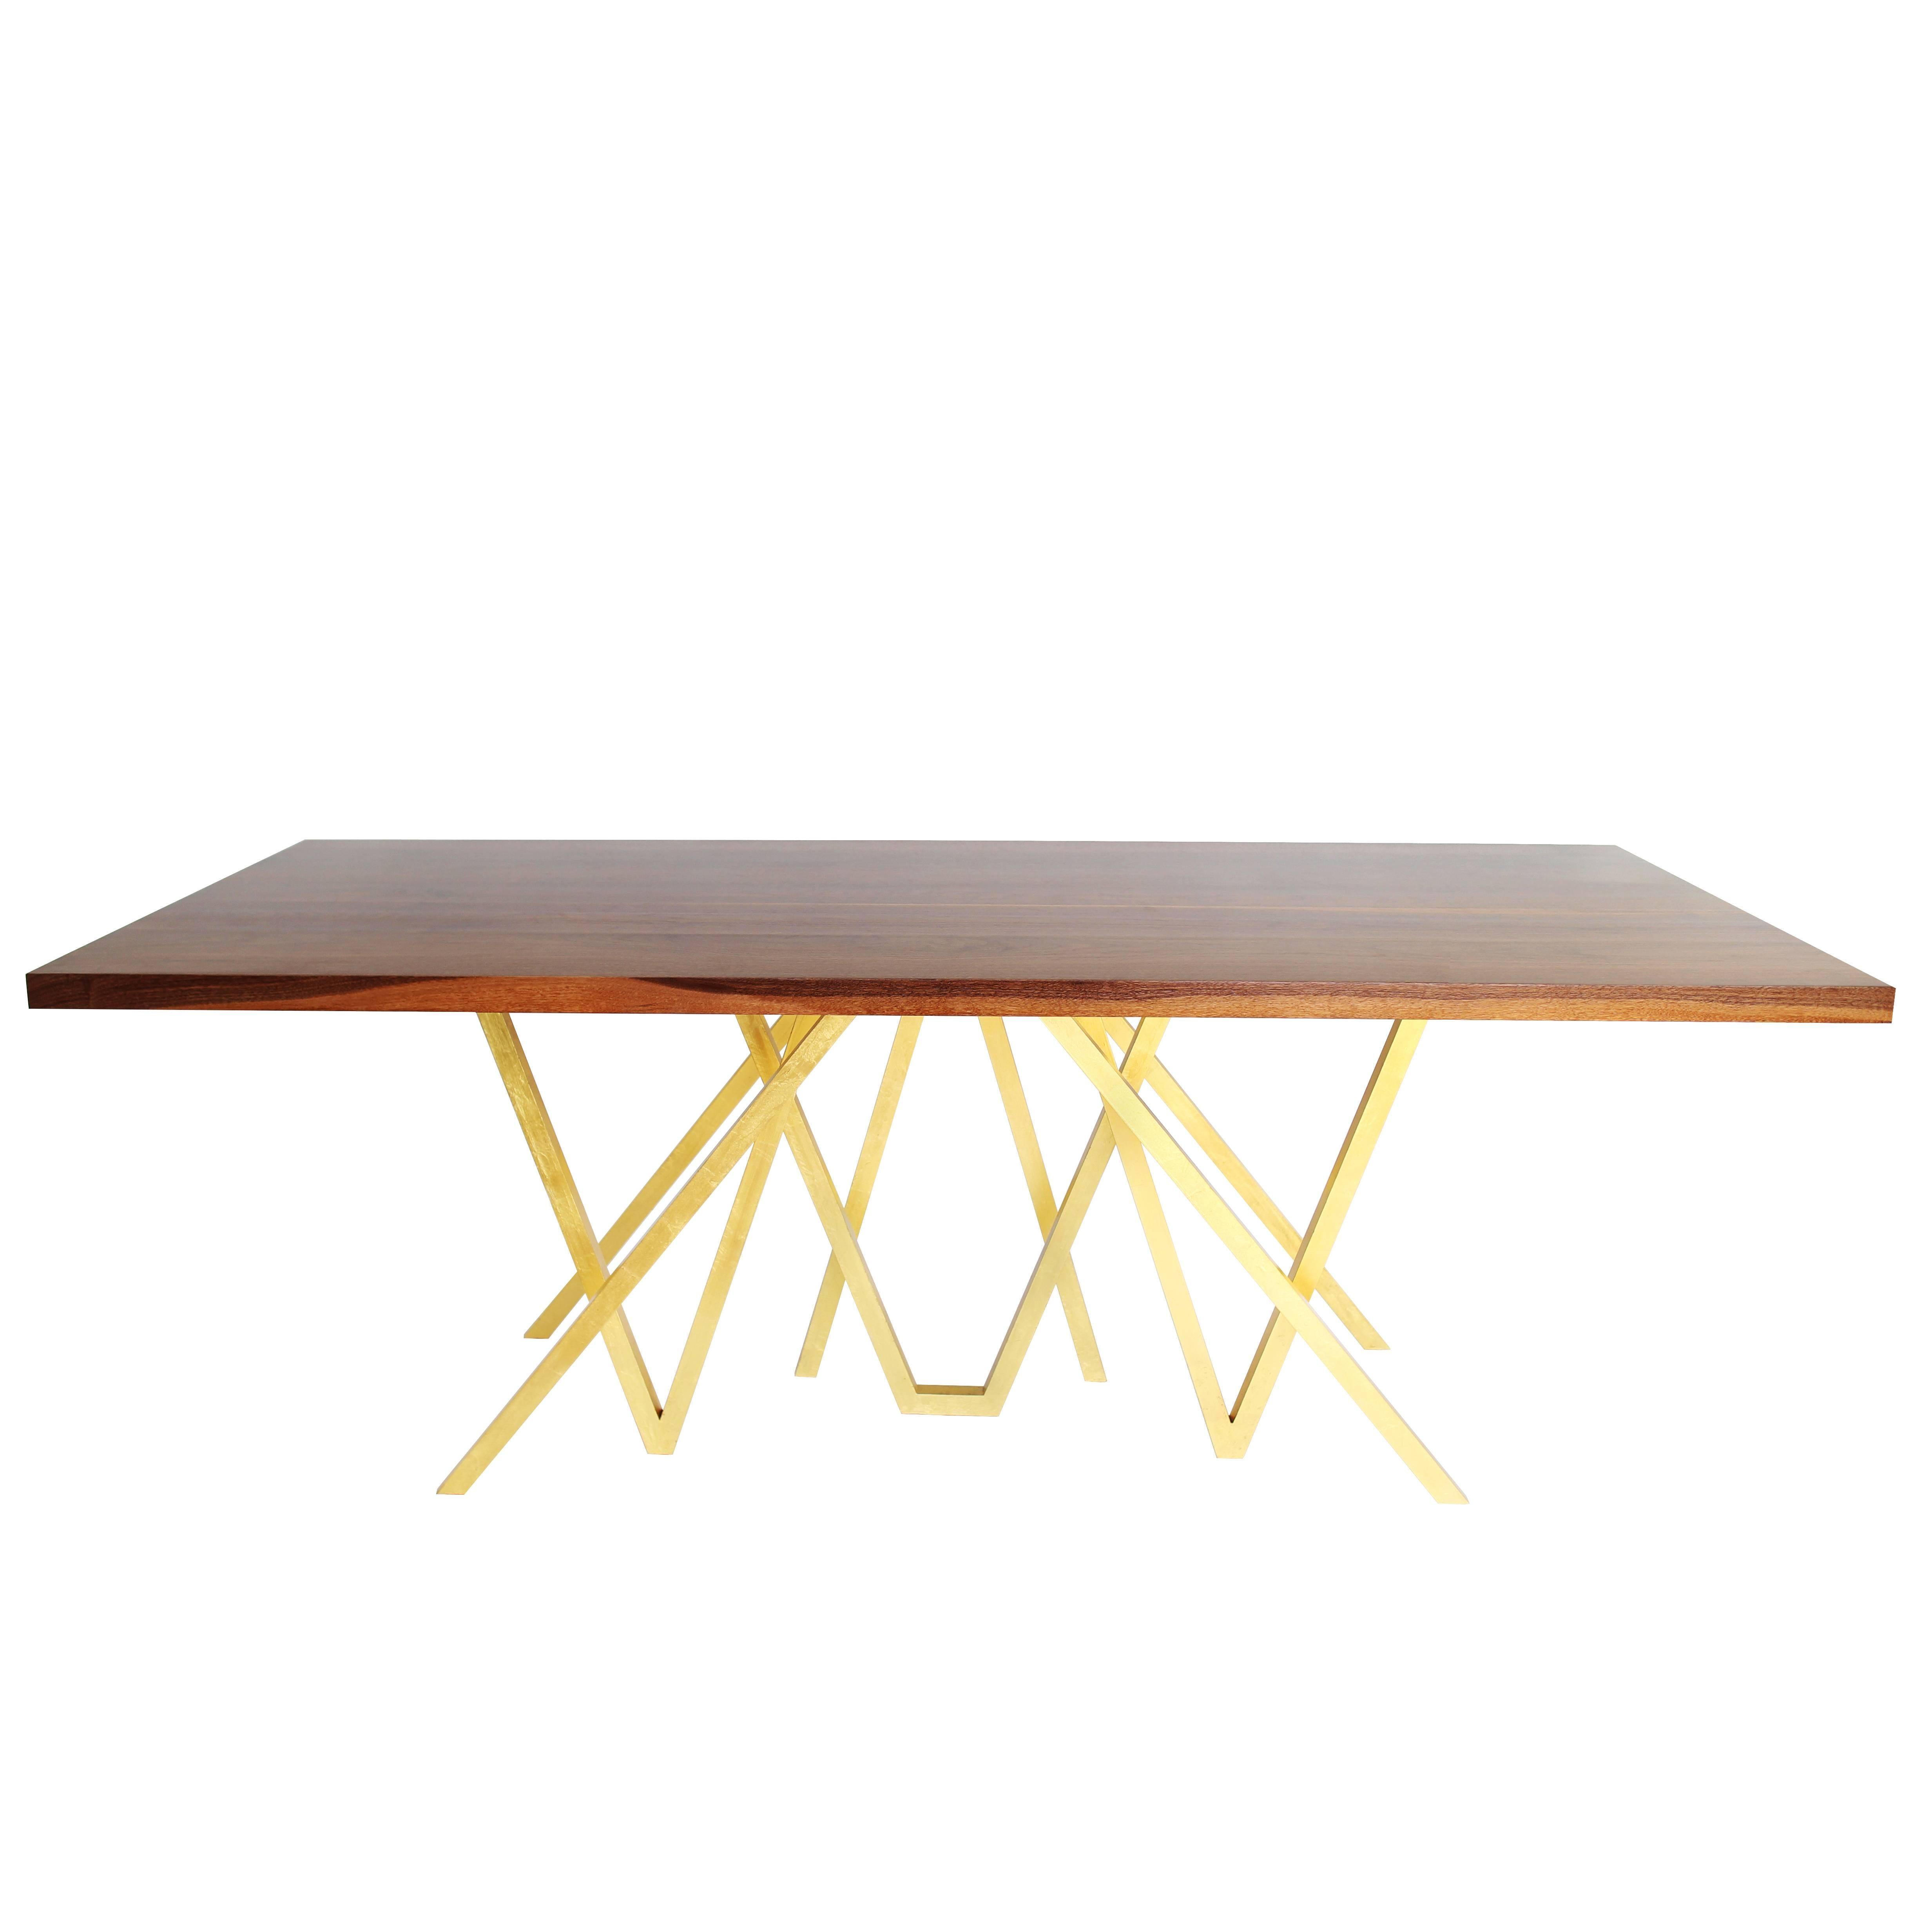 "Contemporary Walnut ""Golden Blaze"" Dining Table by Alex Drew & No One, 2016"